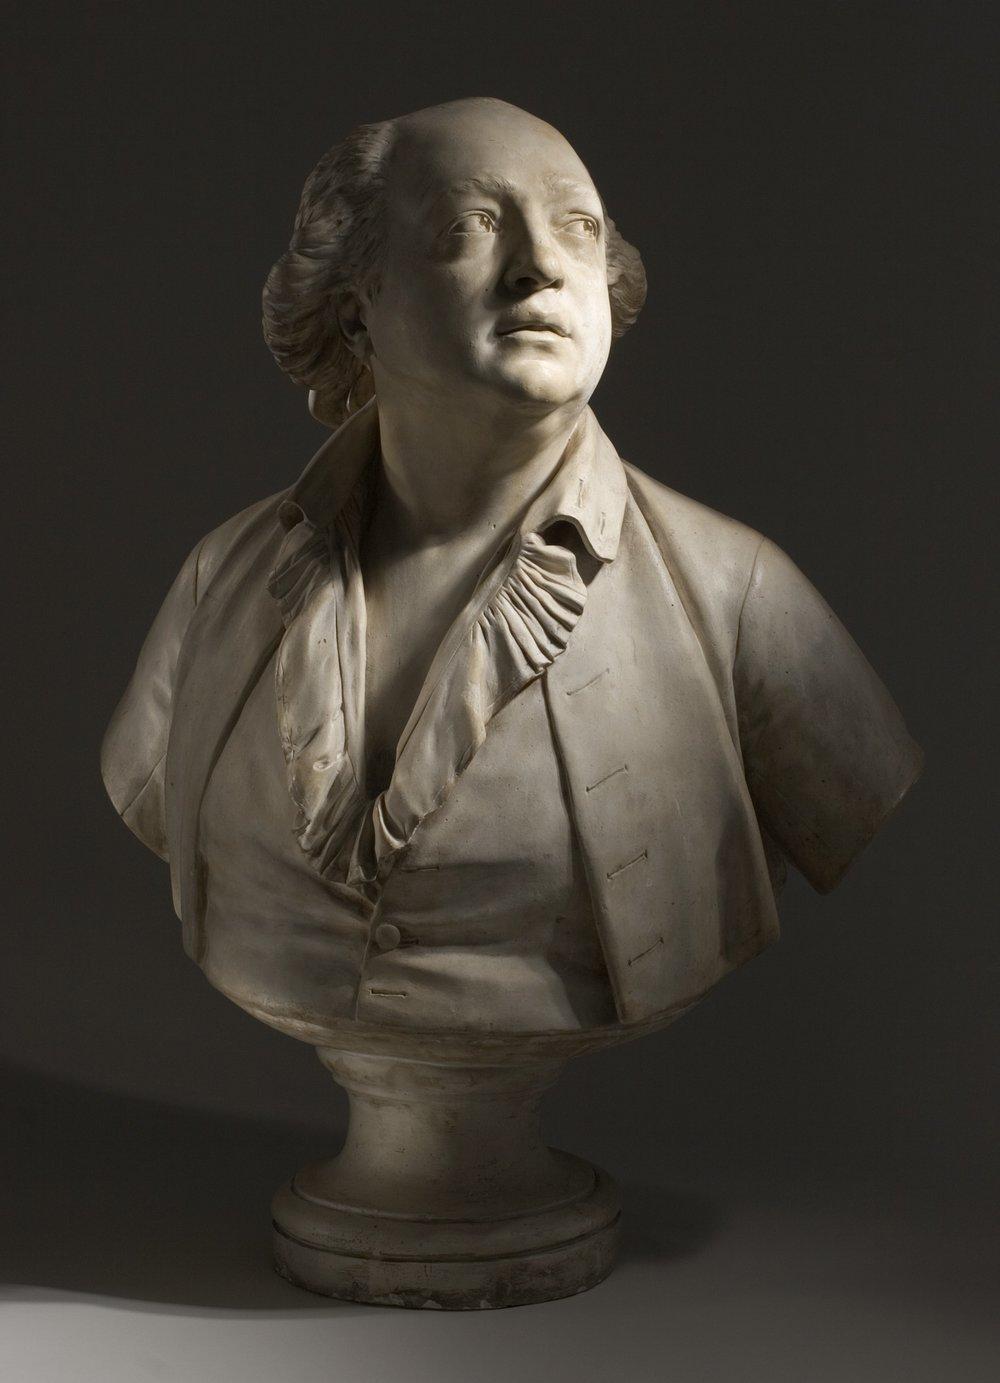 Jean-Antoine Houdon, Portrait of Giuseppe Balsamo (called Count Alessandro Cagliostro), circa 1786, Los Angeles County Museum of Art